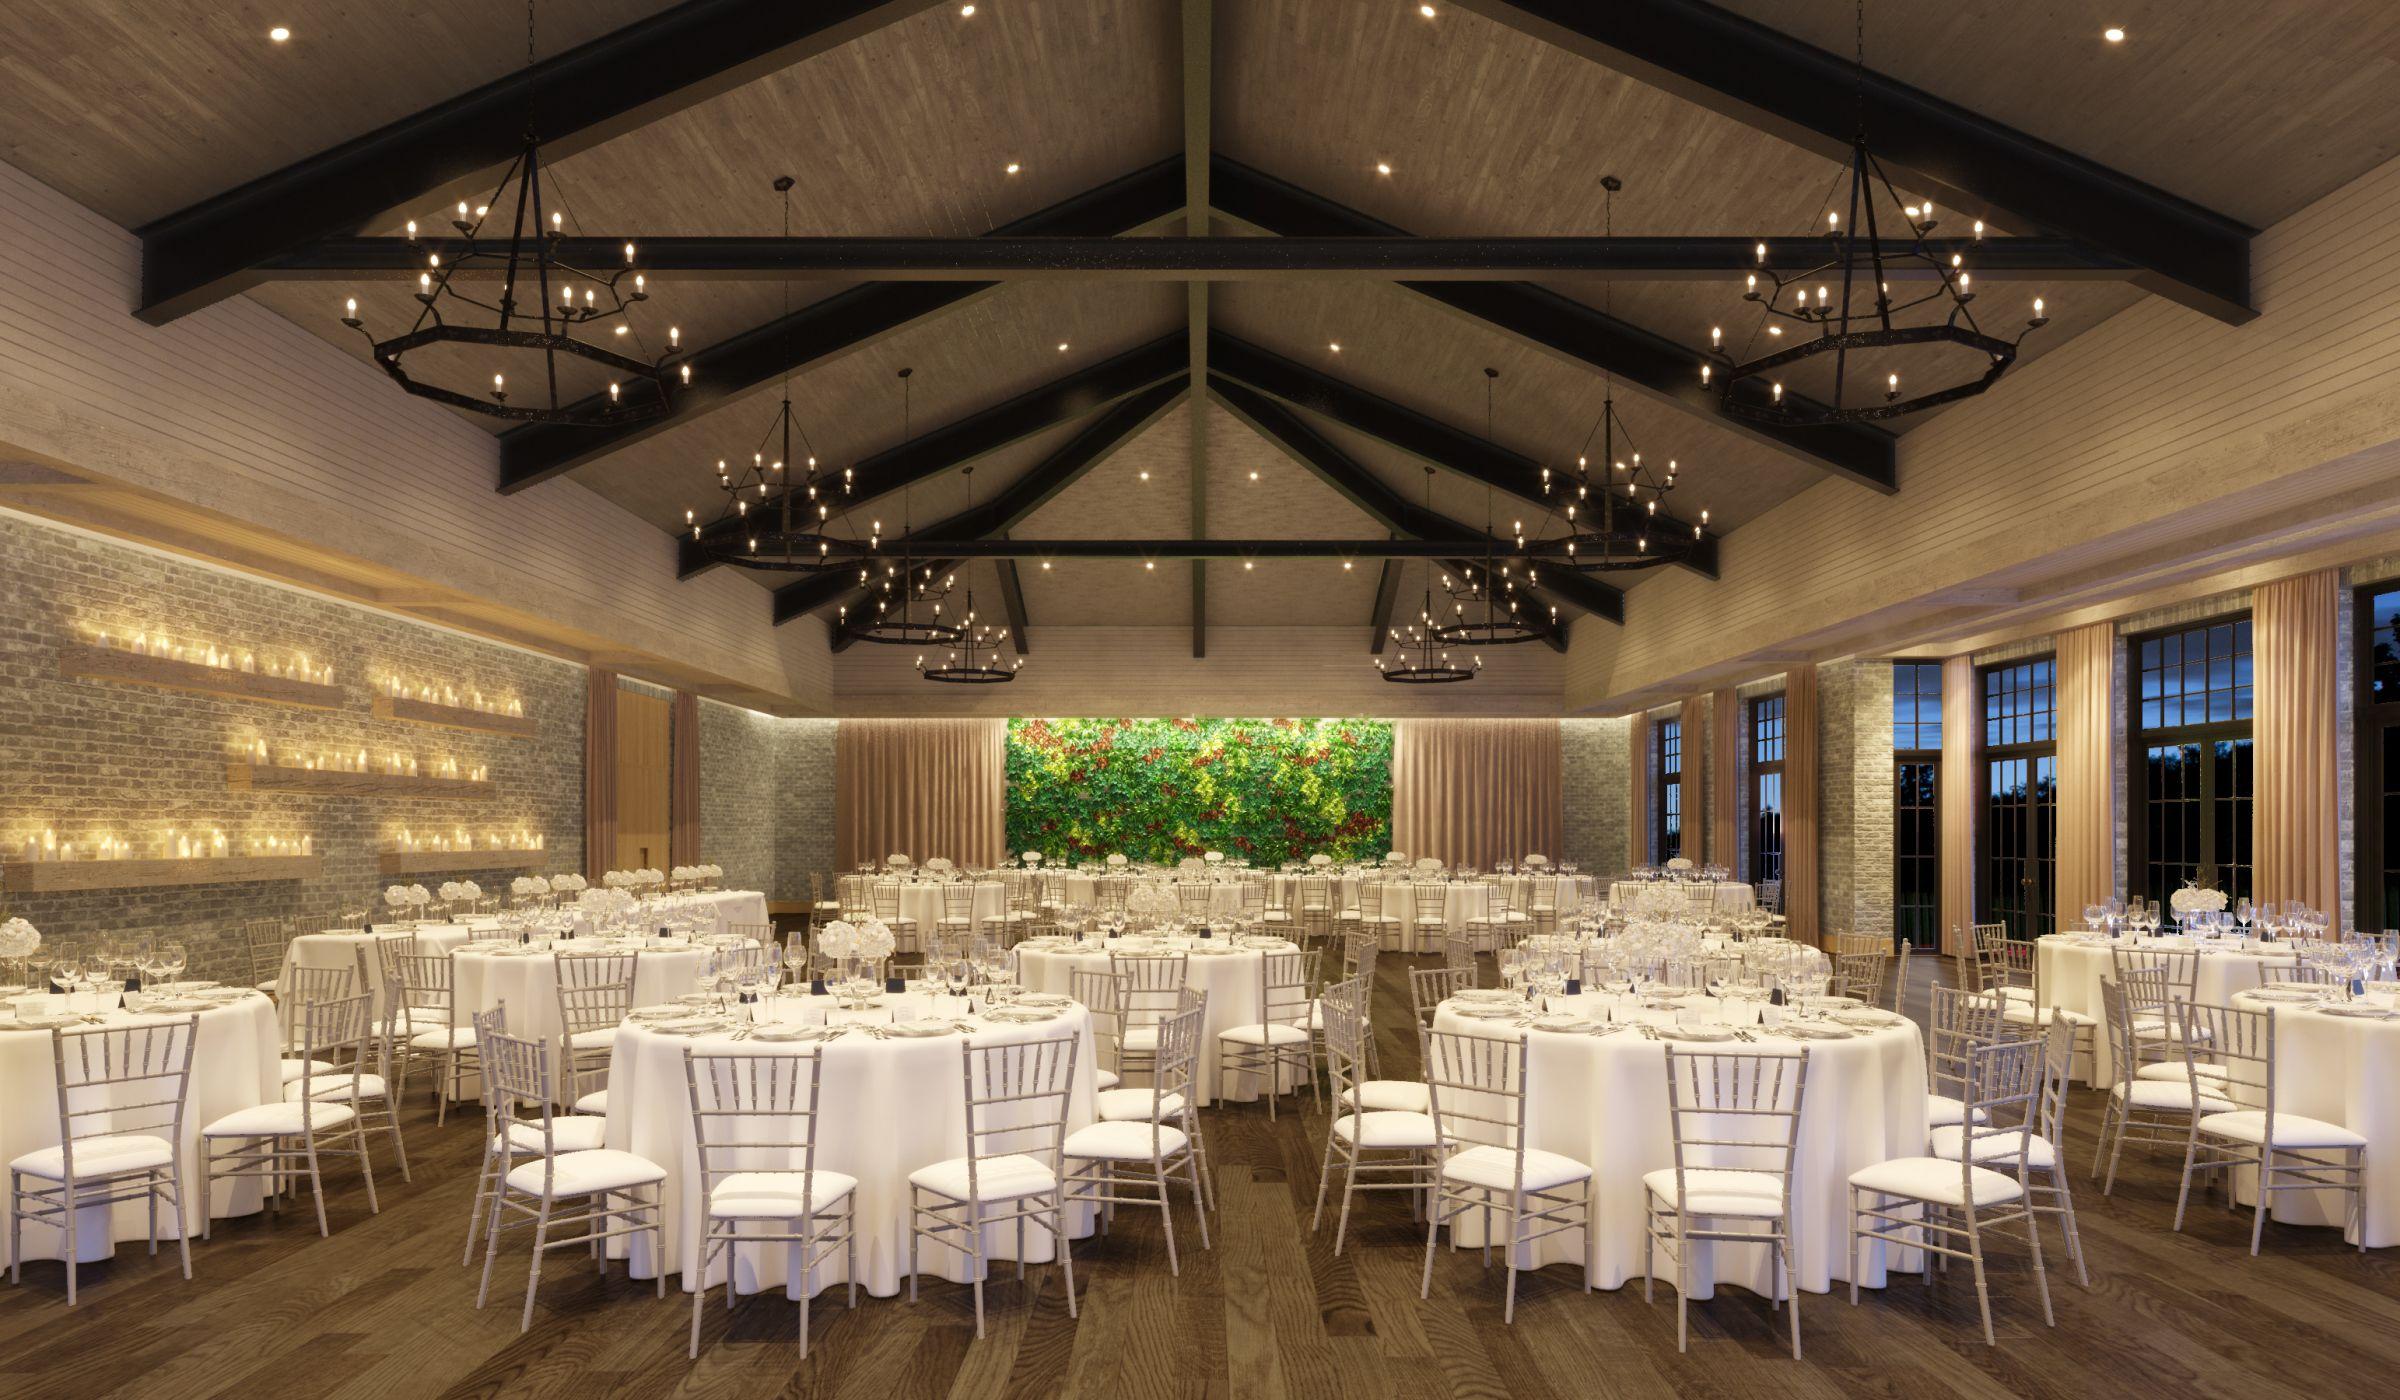 8 Wedding Venue Trends For 2017